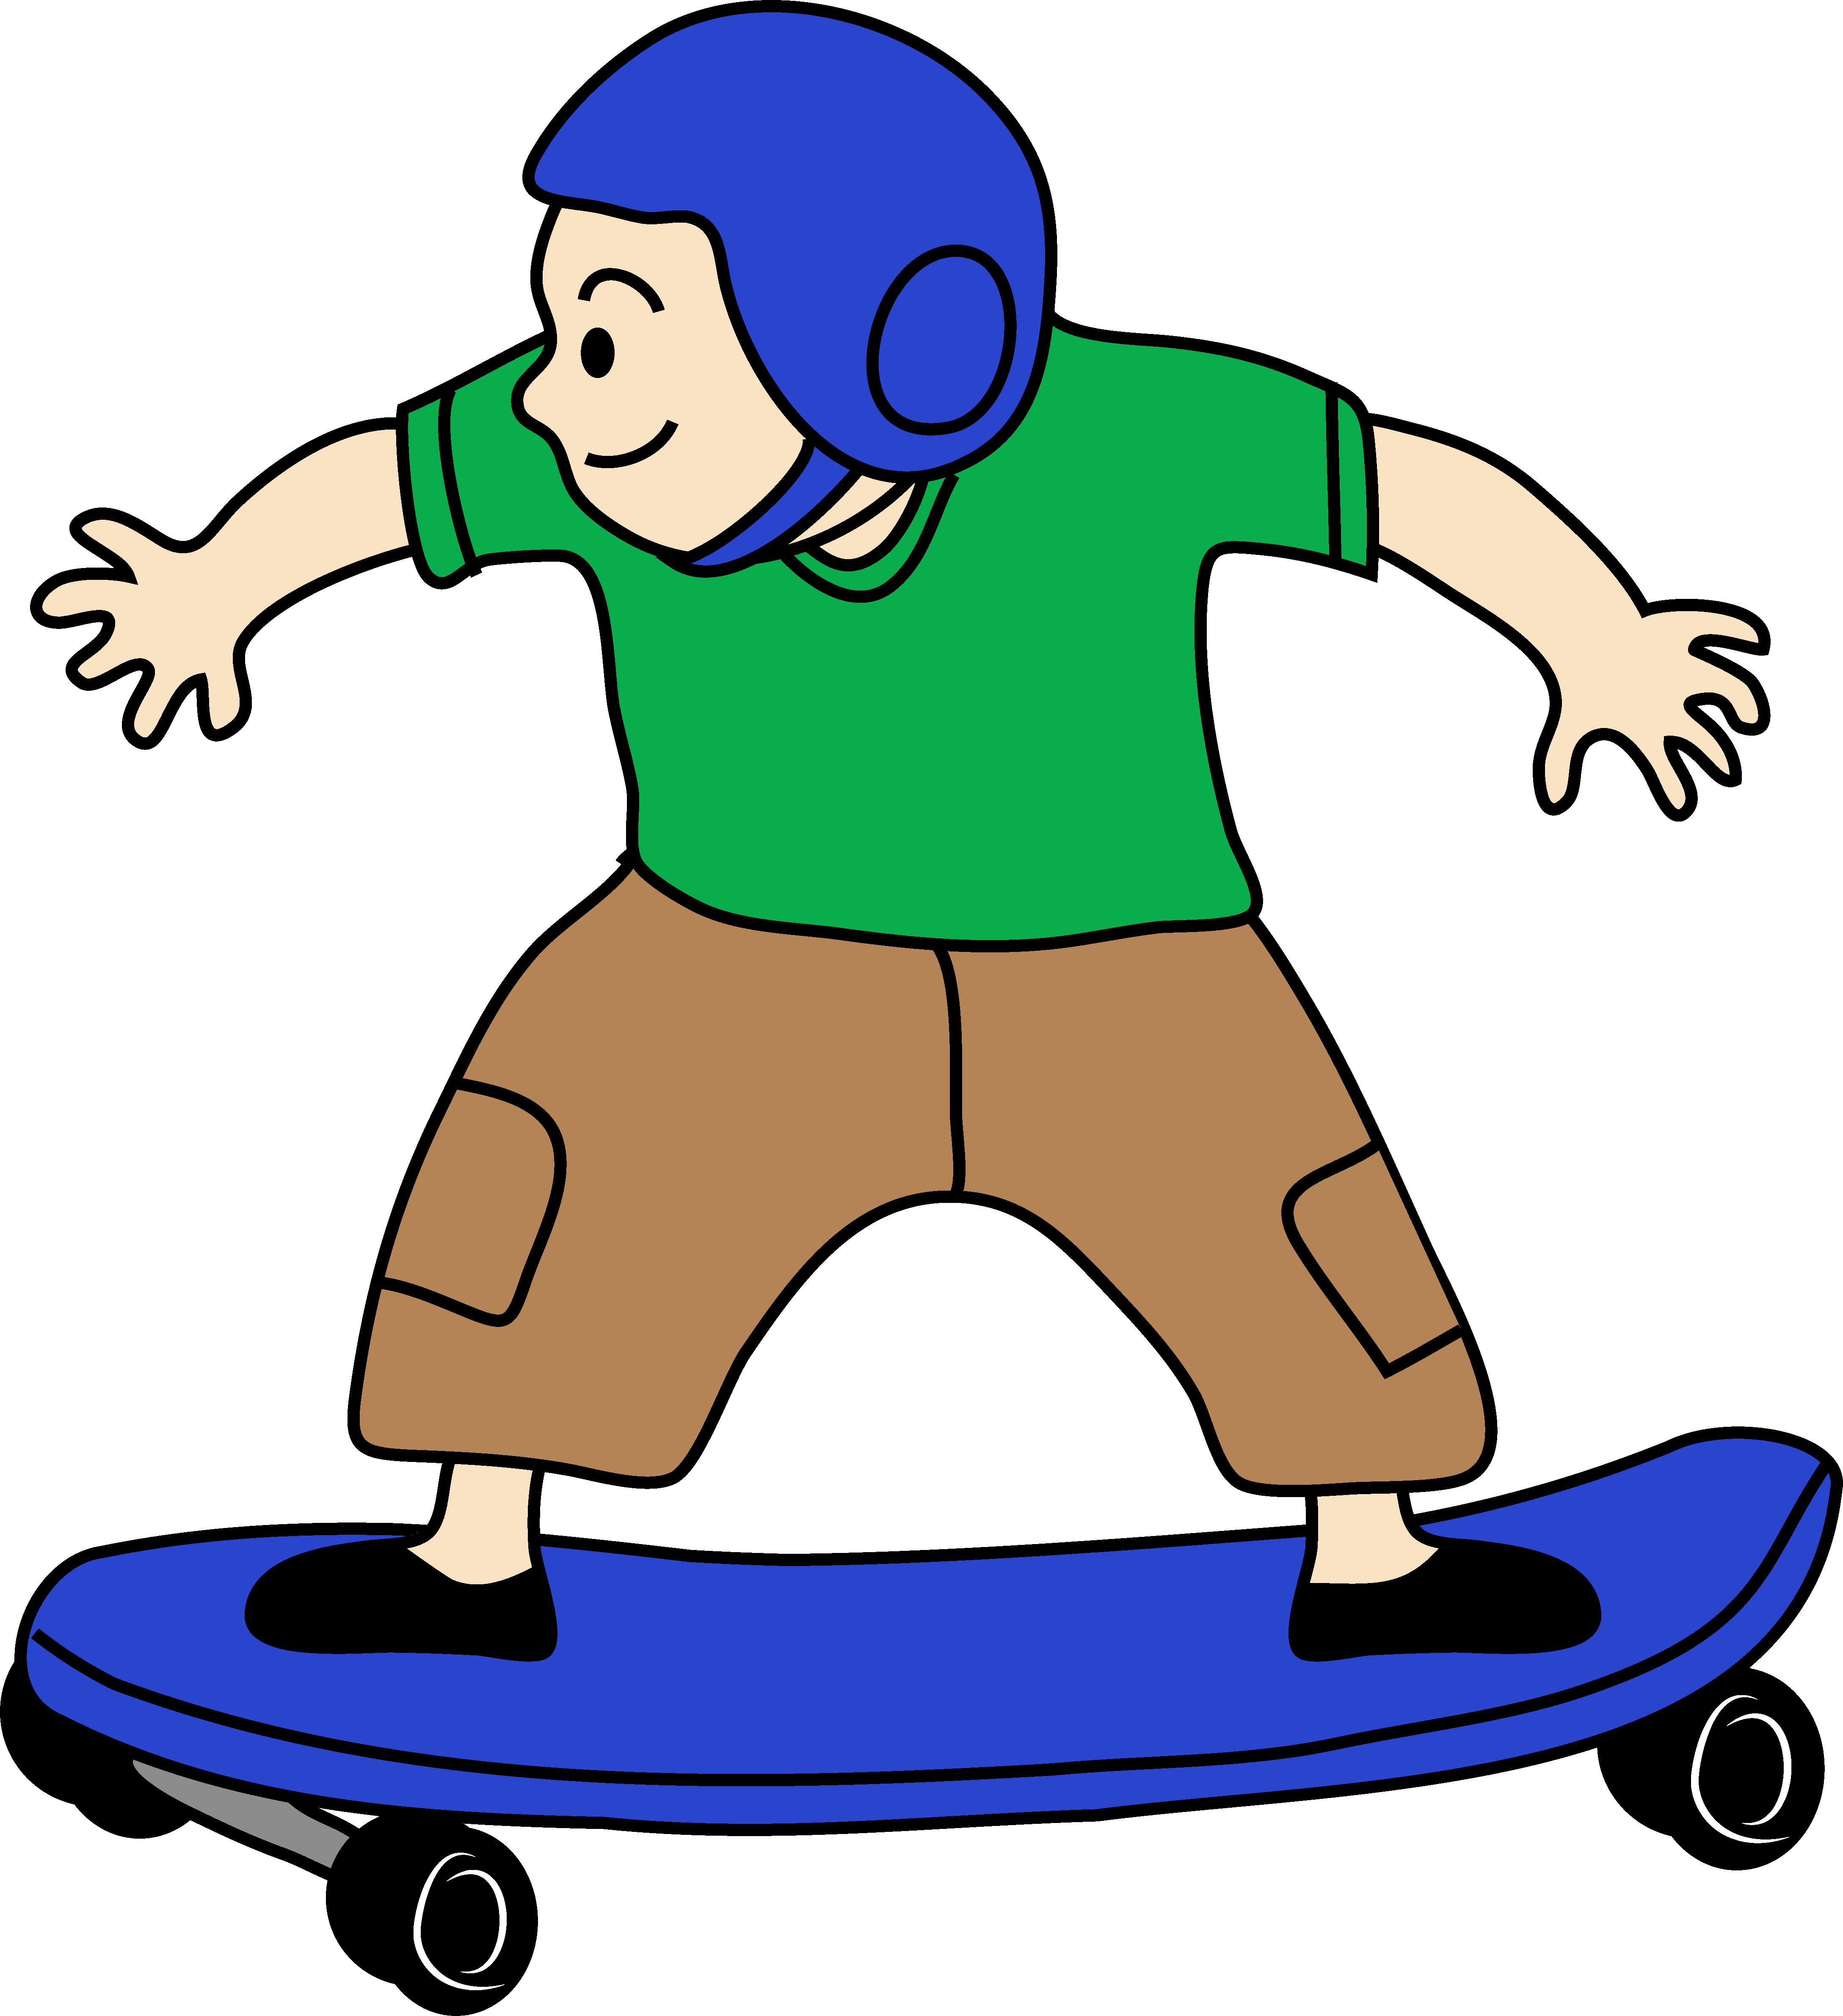 skateboard clipart clipart panda free clipart images rh clipartpanda com skateboard clip art graffiti skateboard clip art free